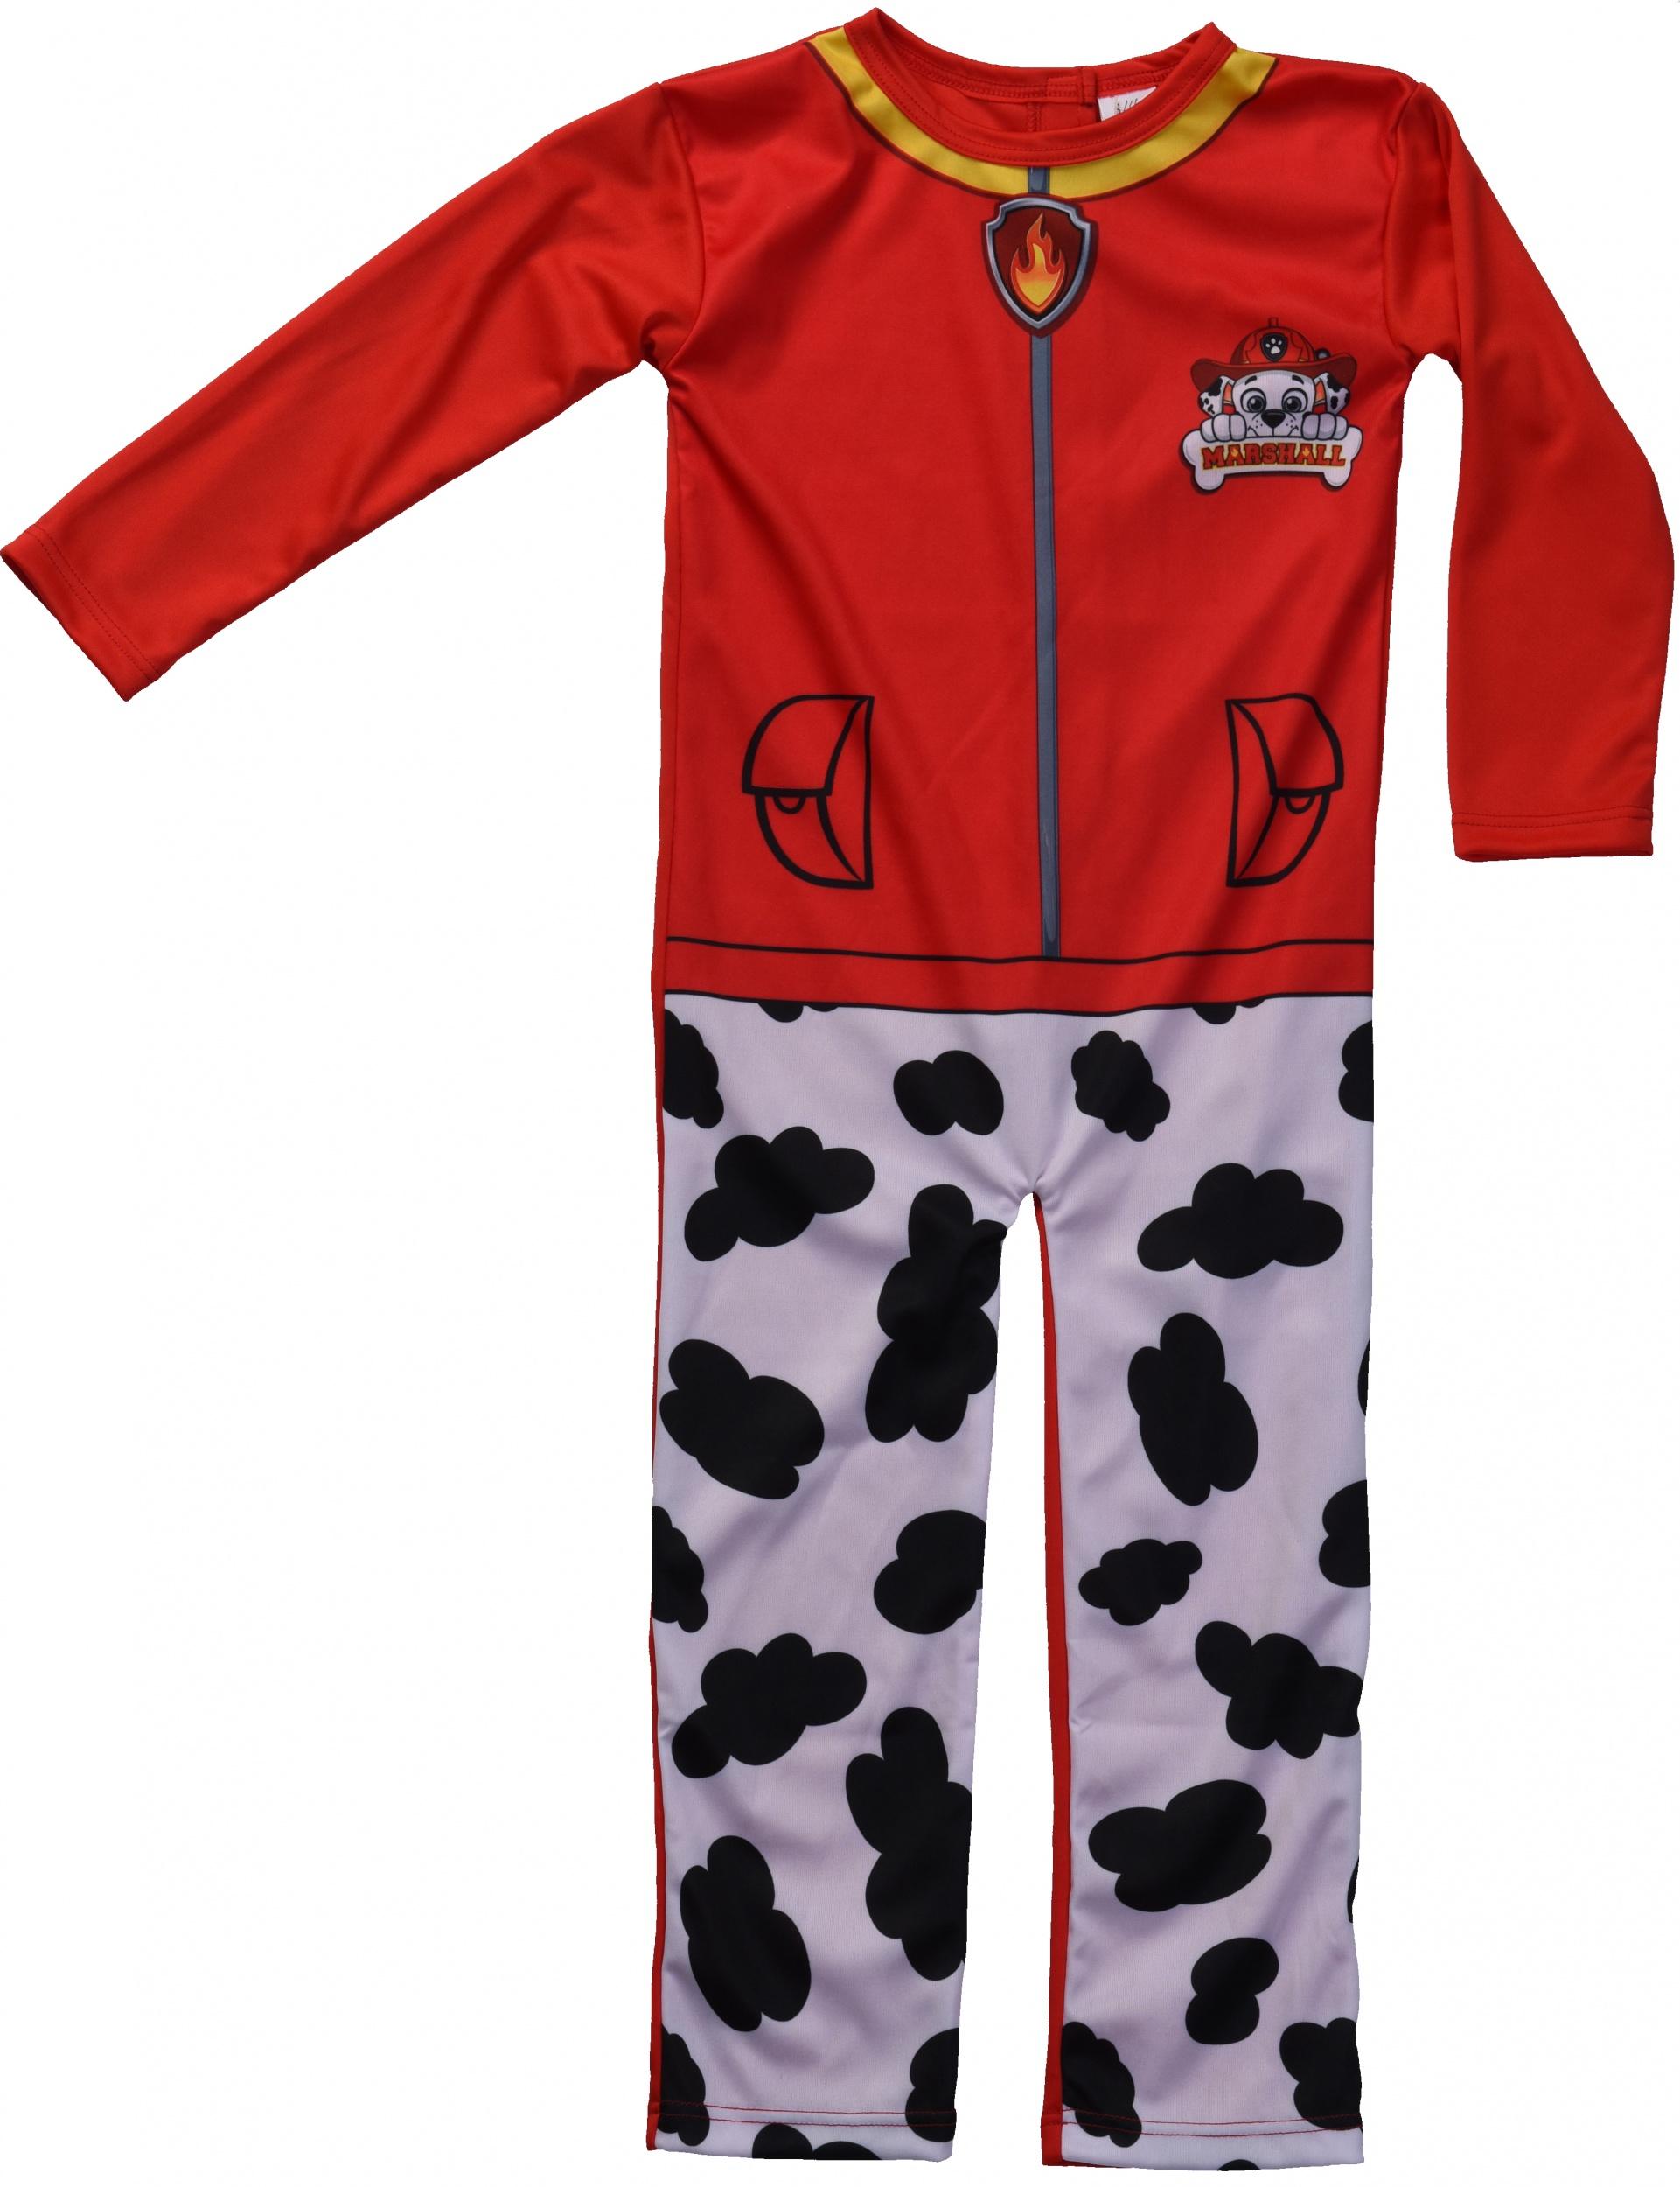 Paw Patrol onesie Marshall red junior 5-6 years